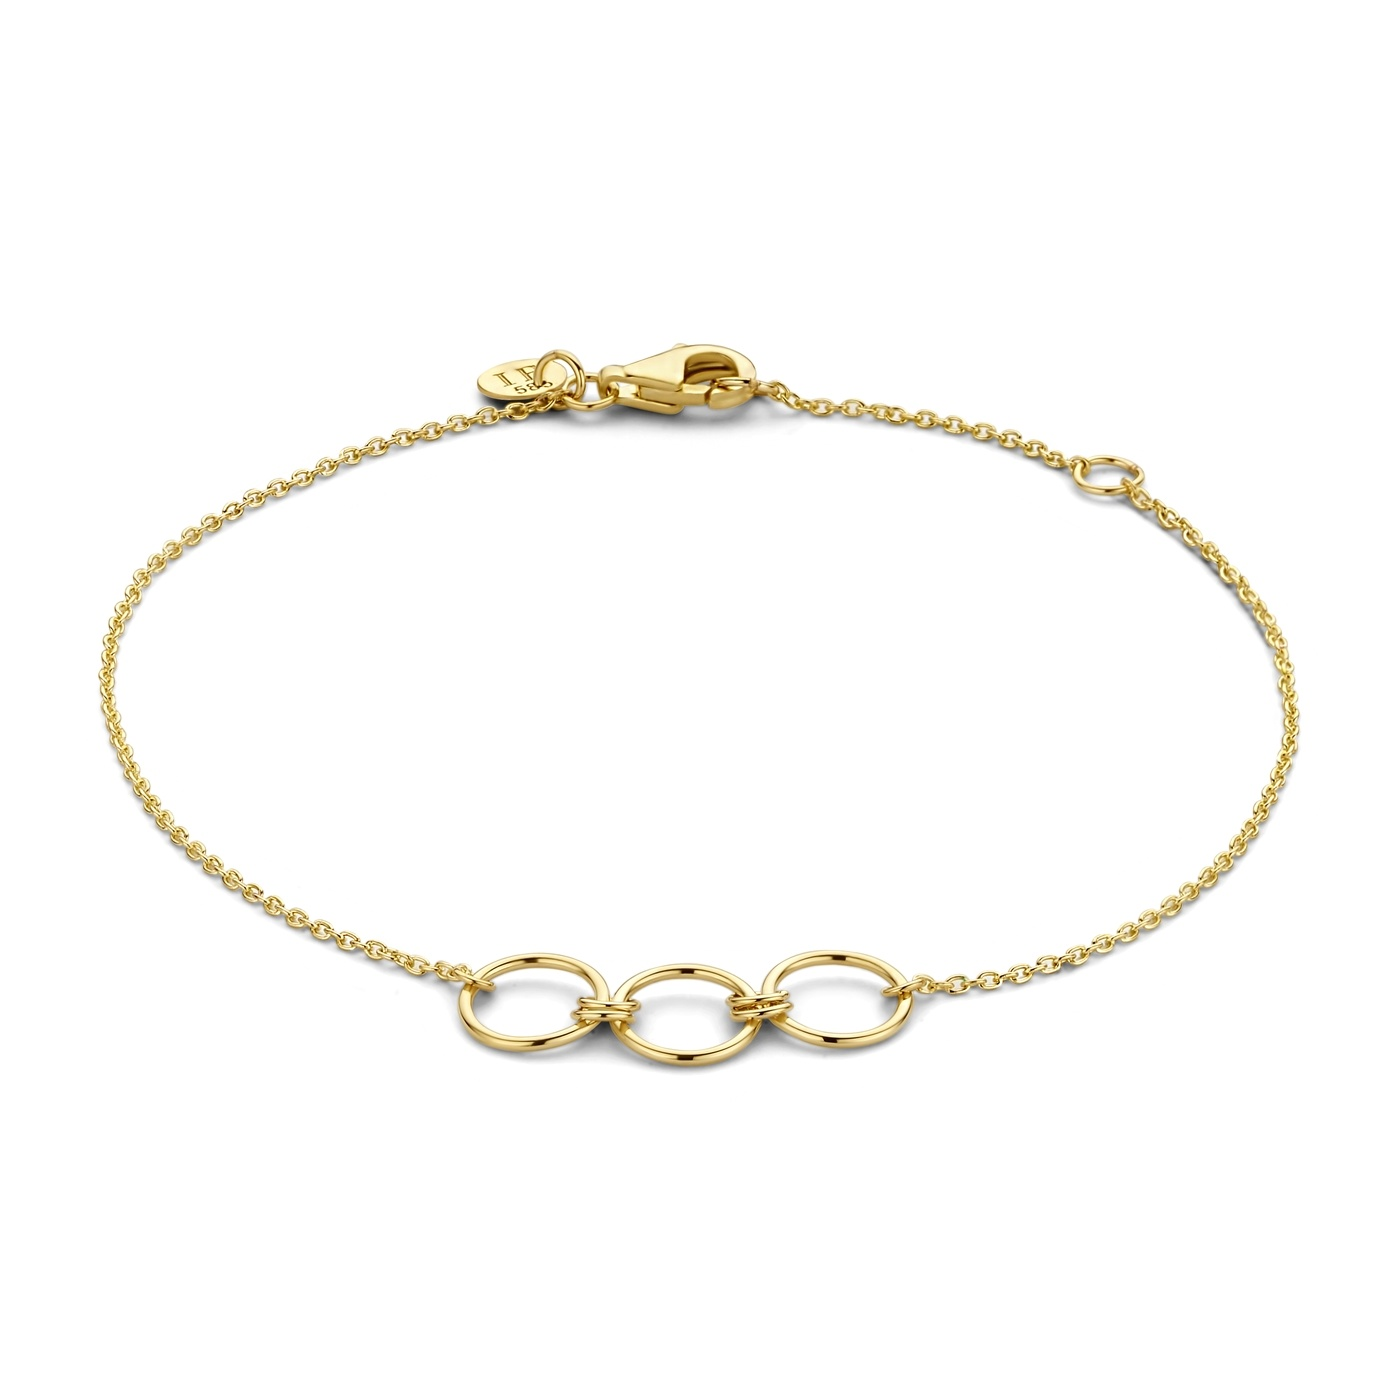 Isabel Bernard Belleville Anna bracciale in oro 14 carati